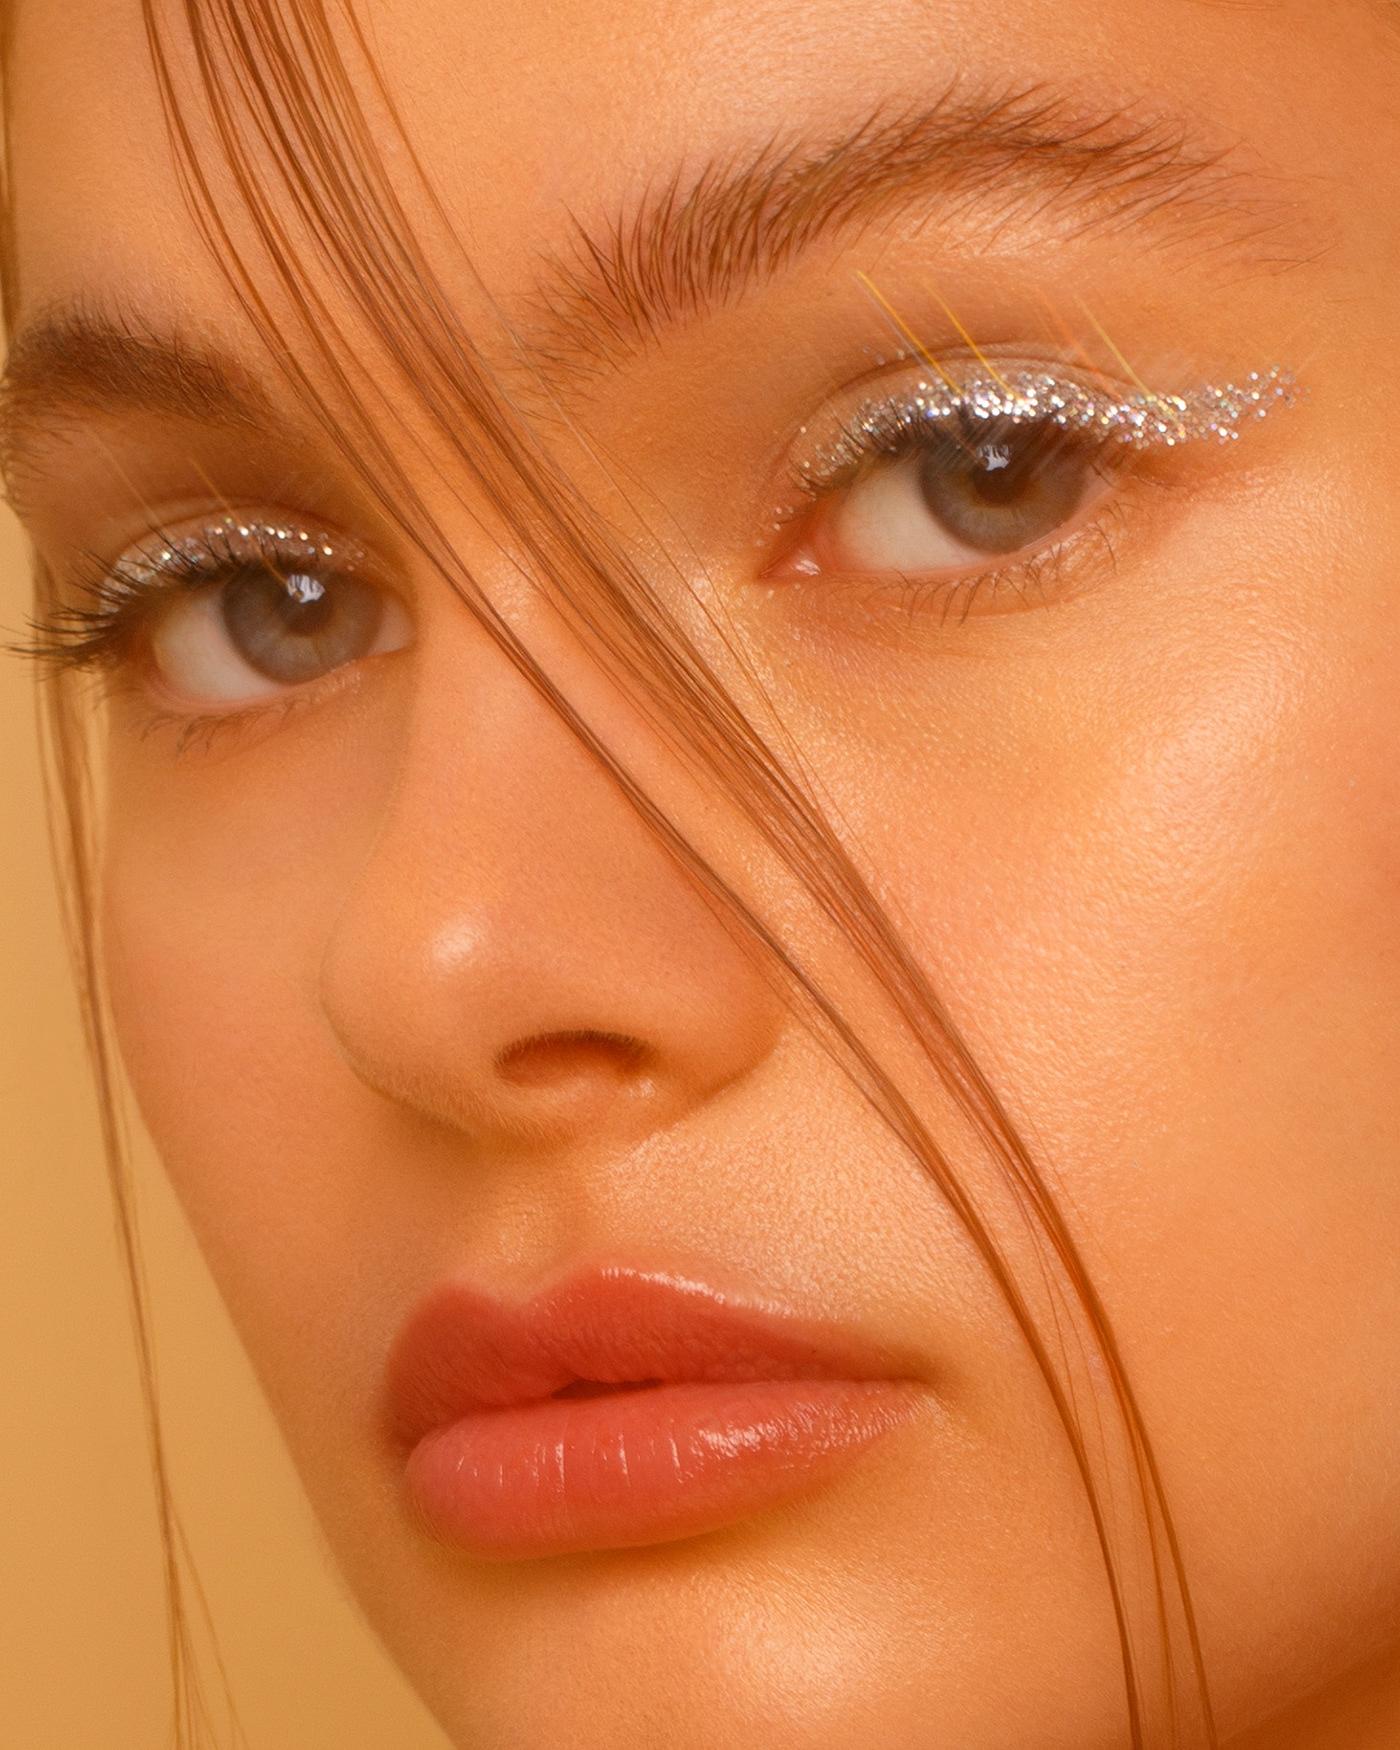 beauty photography berlin photographer Glitter Macro Photography makeup model Photography  portrait photography retouch Studio Photography